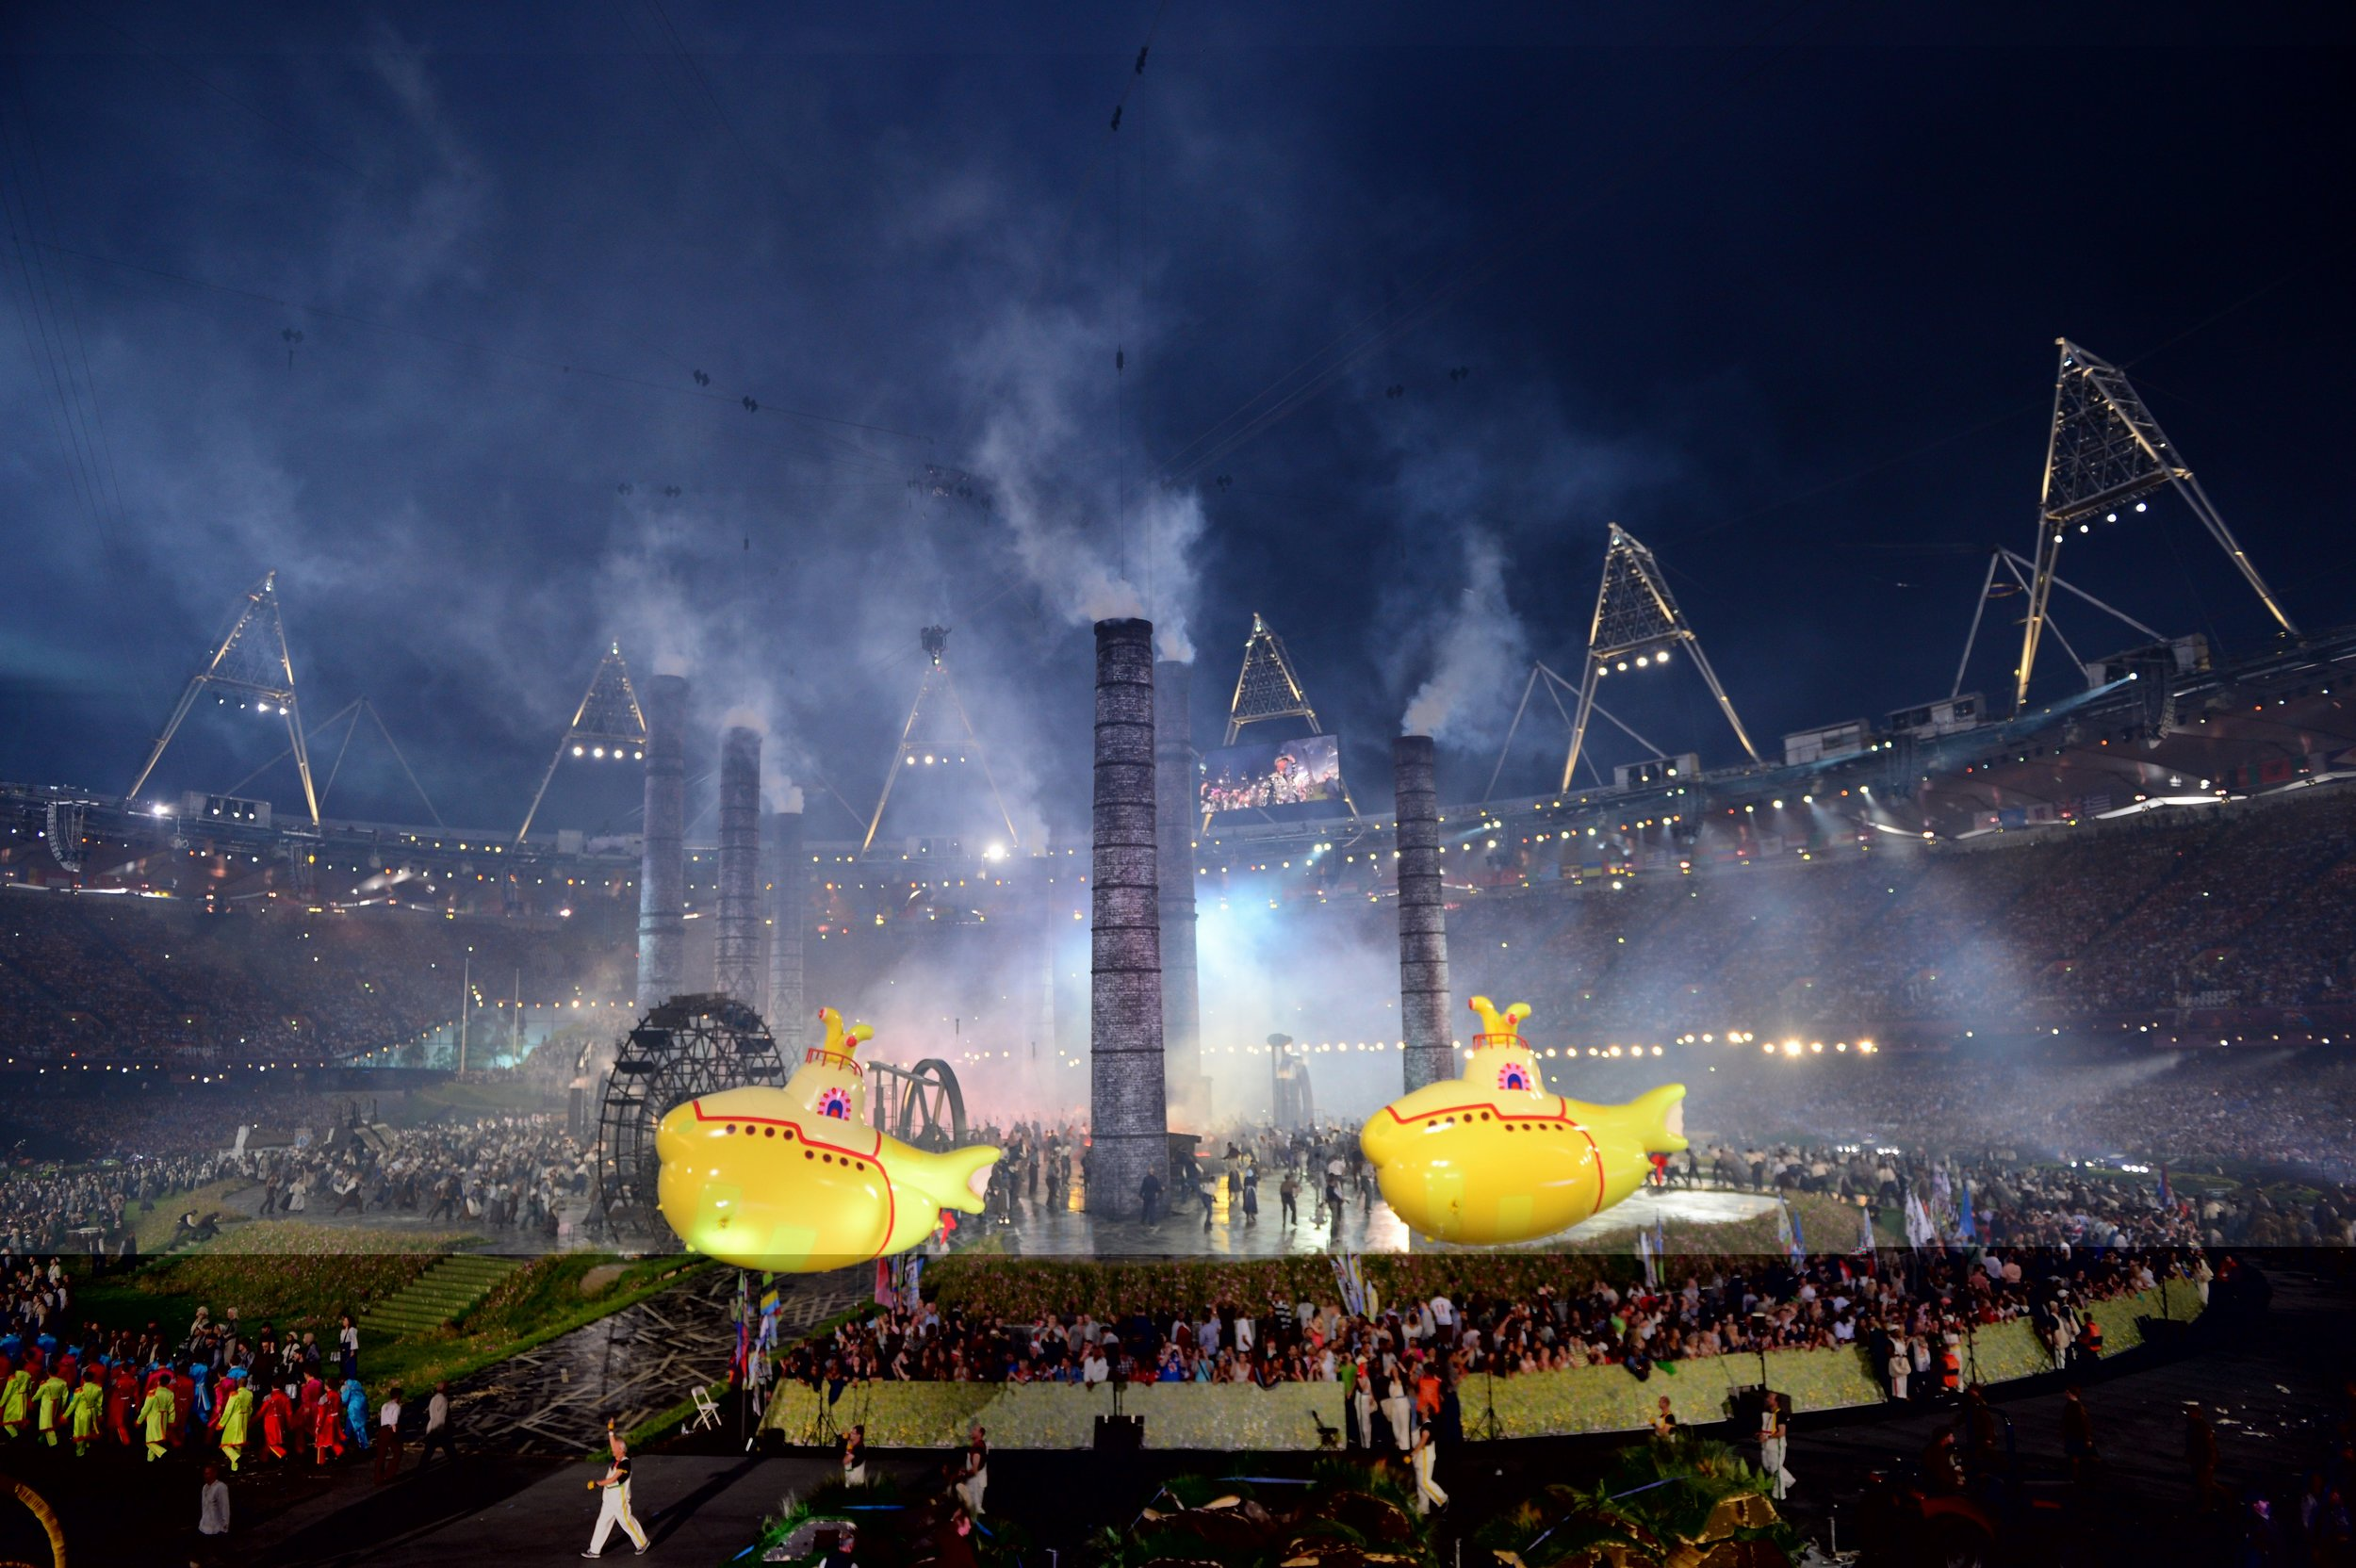 #7 - OLYMPICS OPENING CEREMONY - London